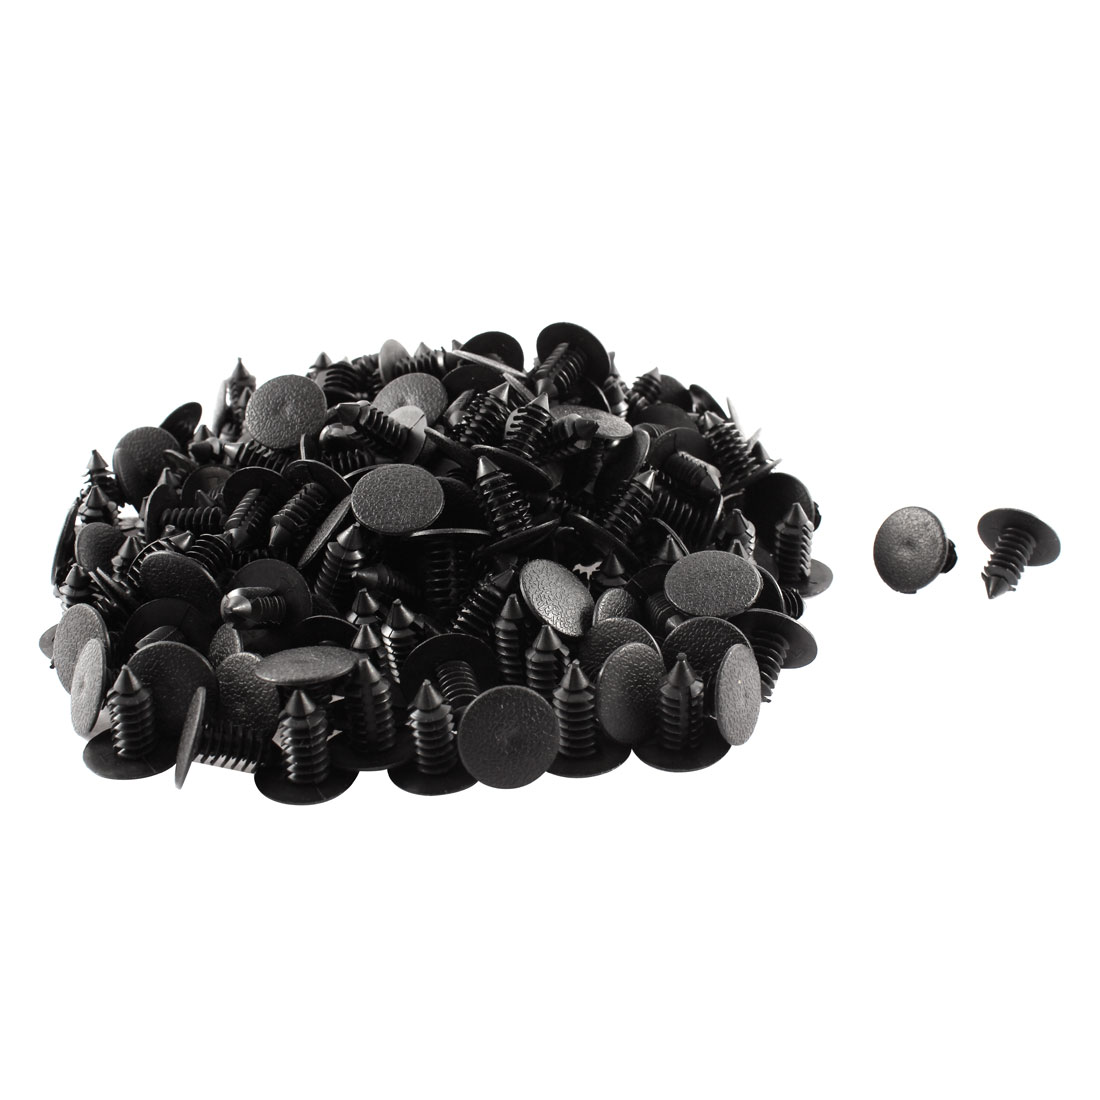 uxcell 30pcs Black Plastic Rivet Clips 9mm x 15mm x 22mm